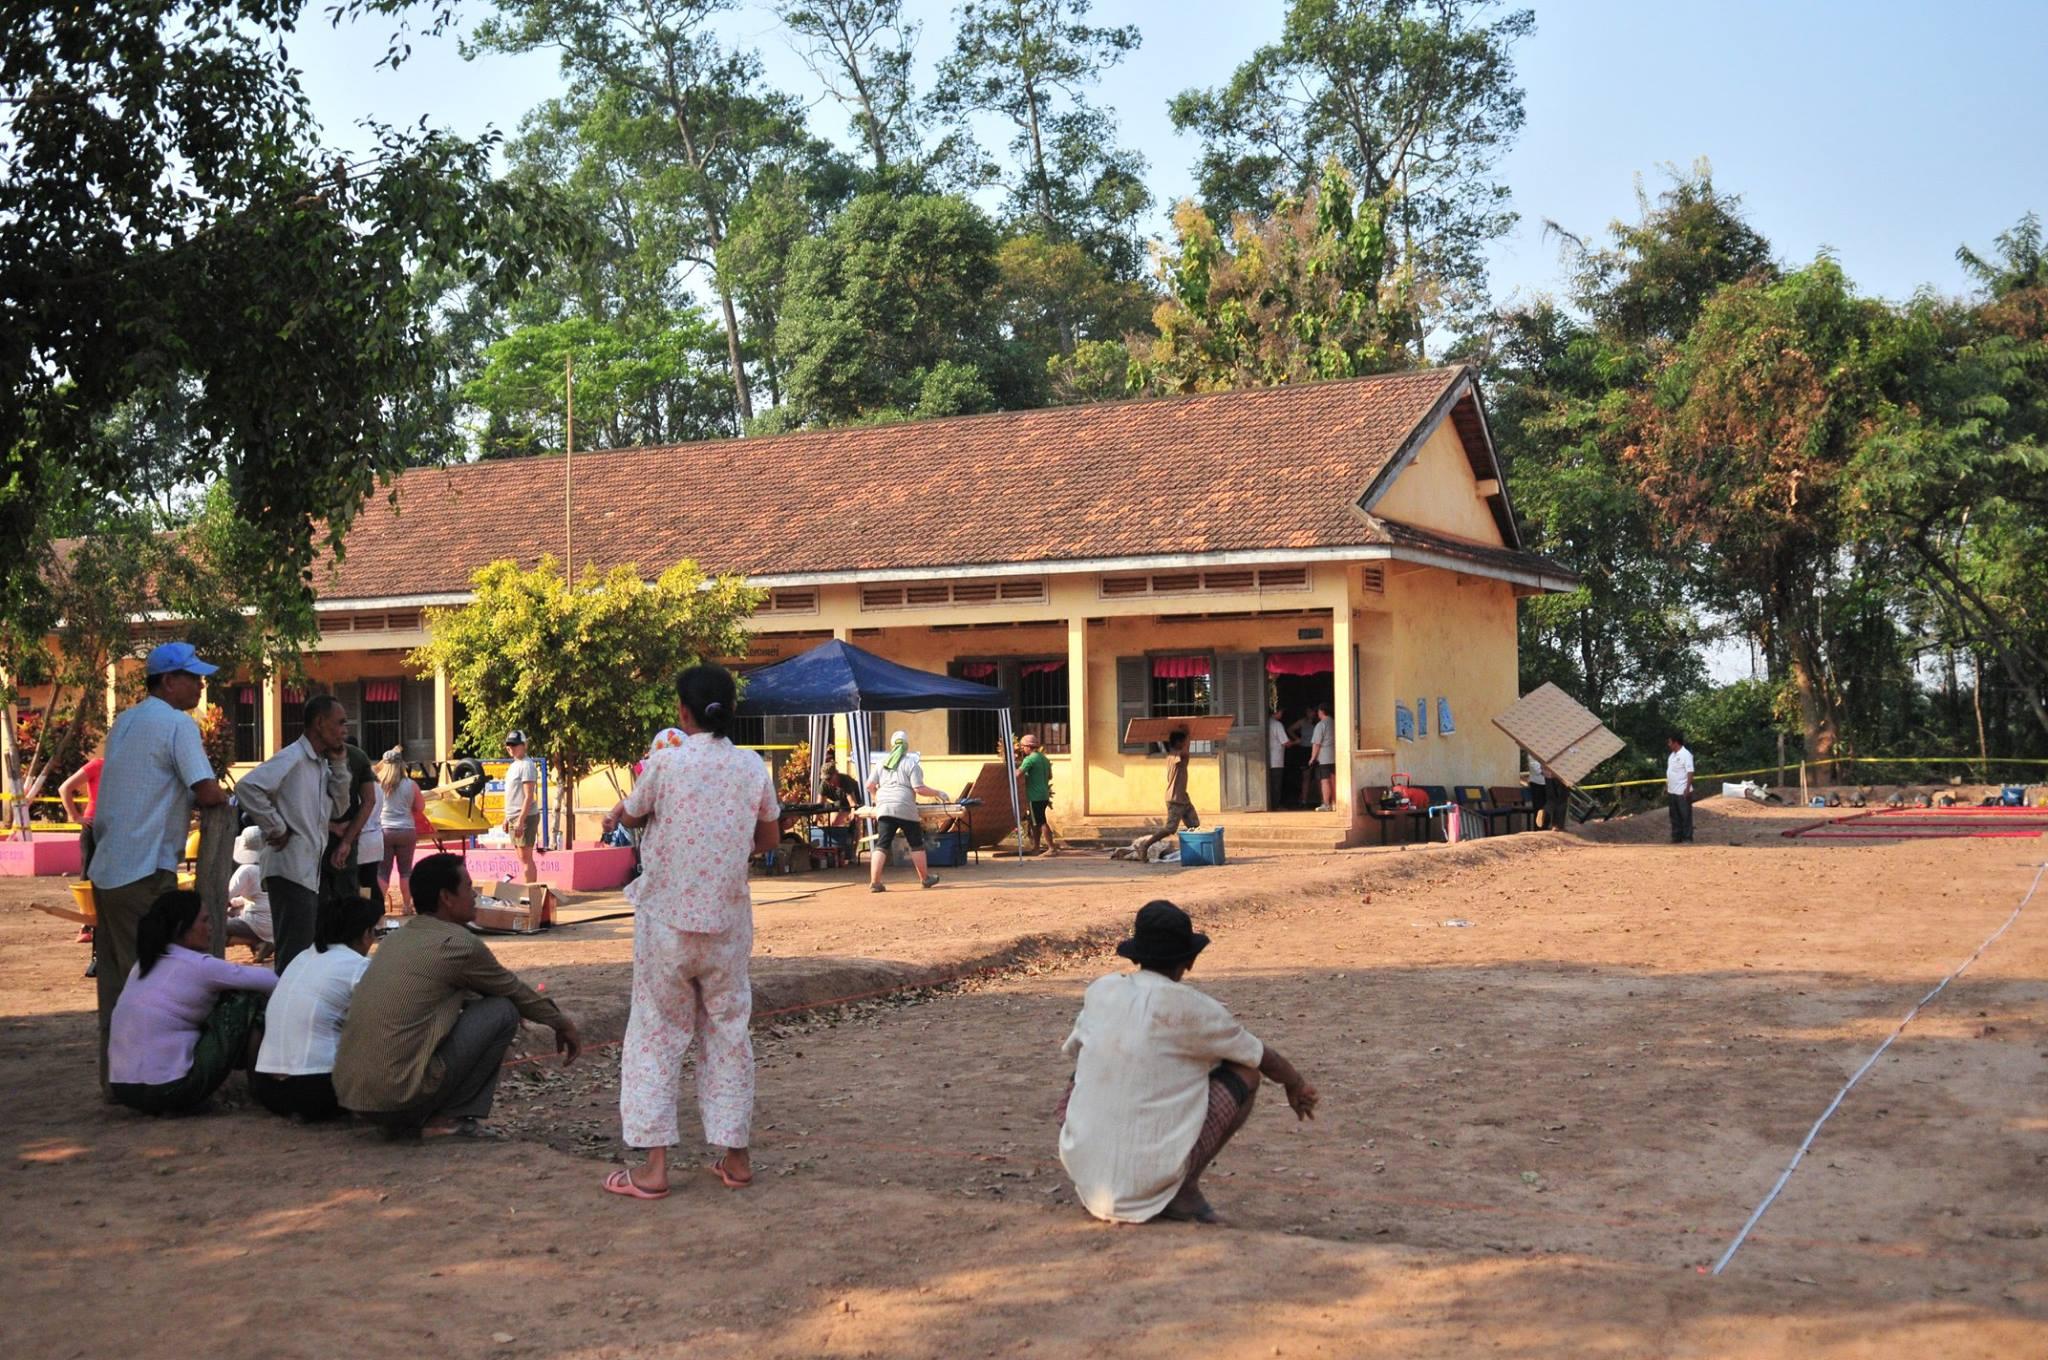 https://0901.nccdn.net/4_2/000/000/010/19b/cambodia23.jpg